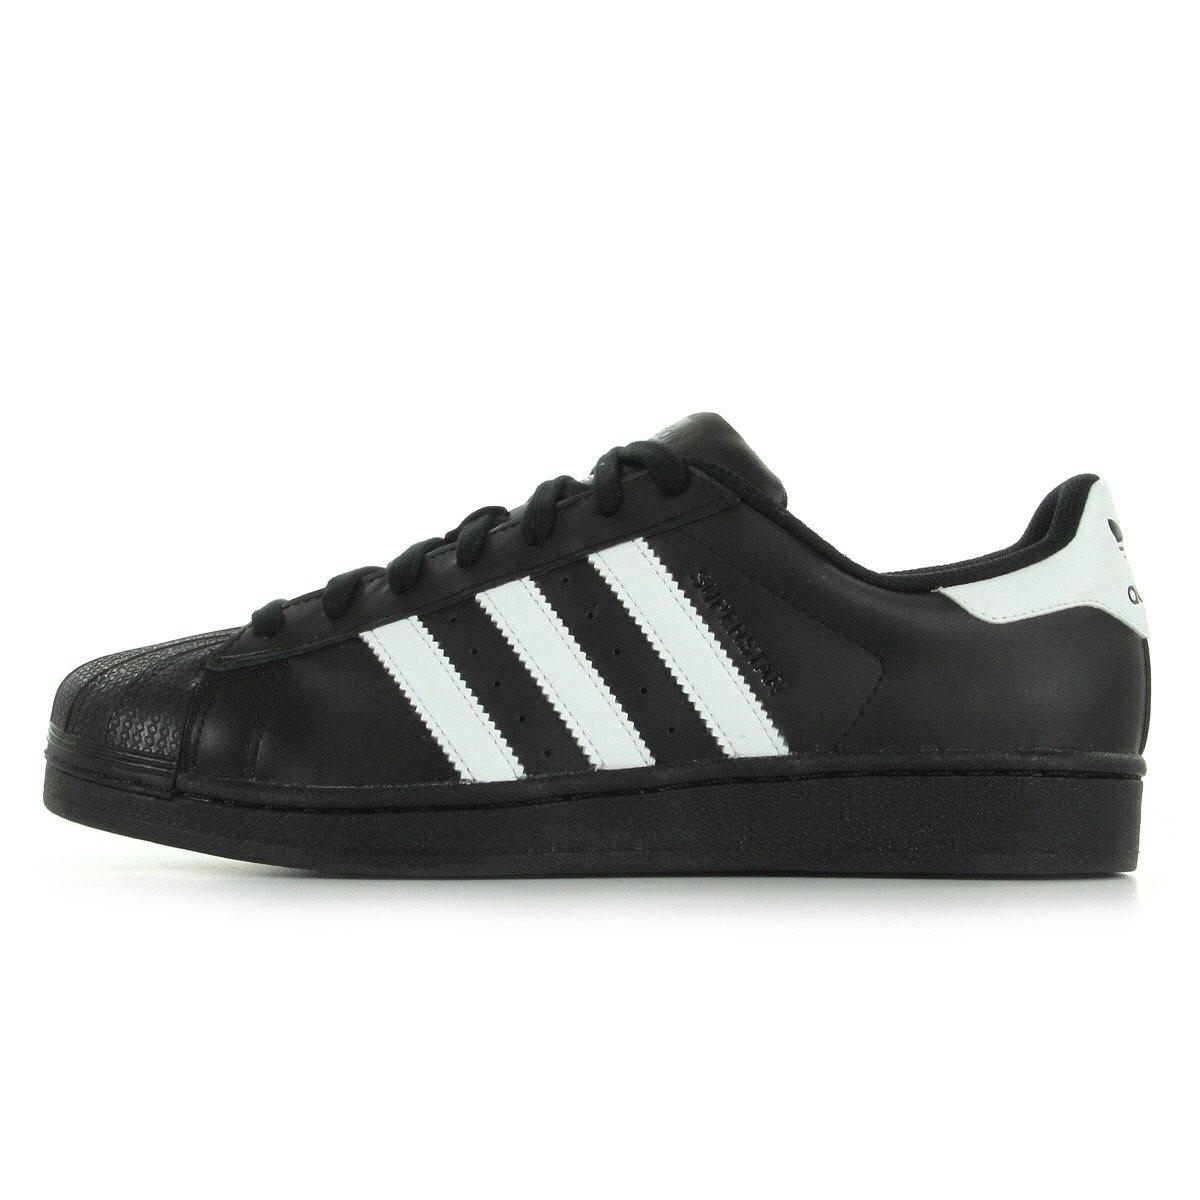 adidas Superstar Foundation, Chaussures de Sport Homme: Amazon.fr: Chaussures et Sacs